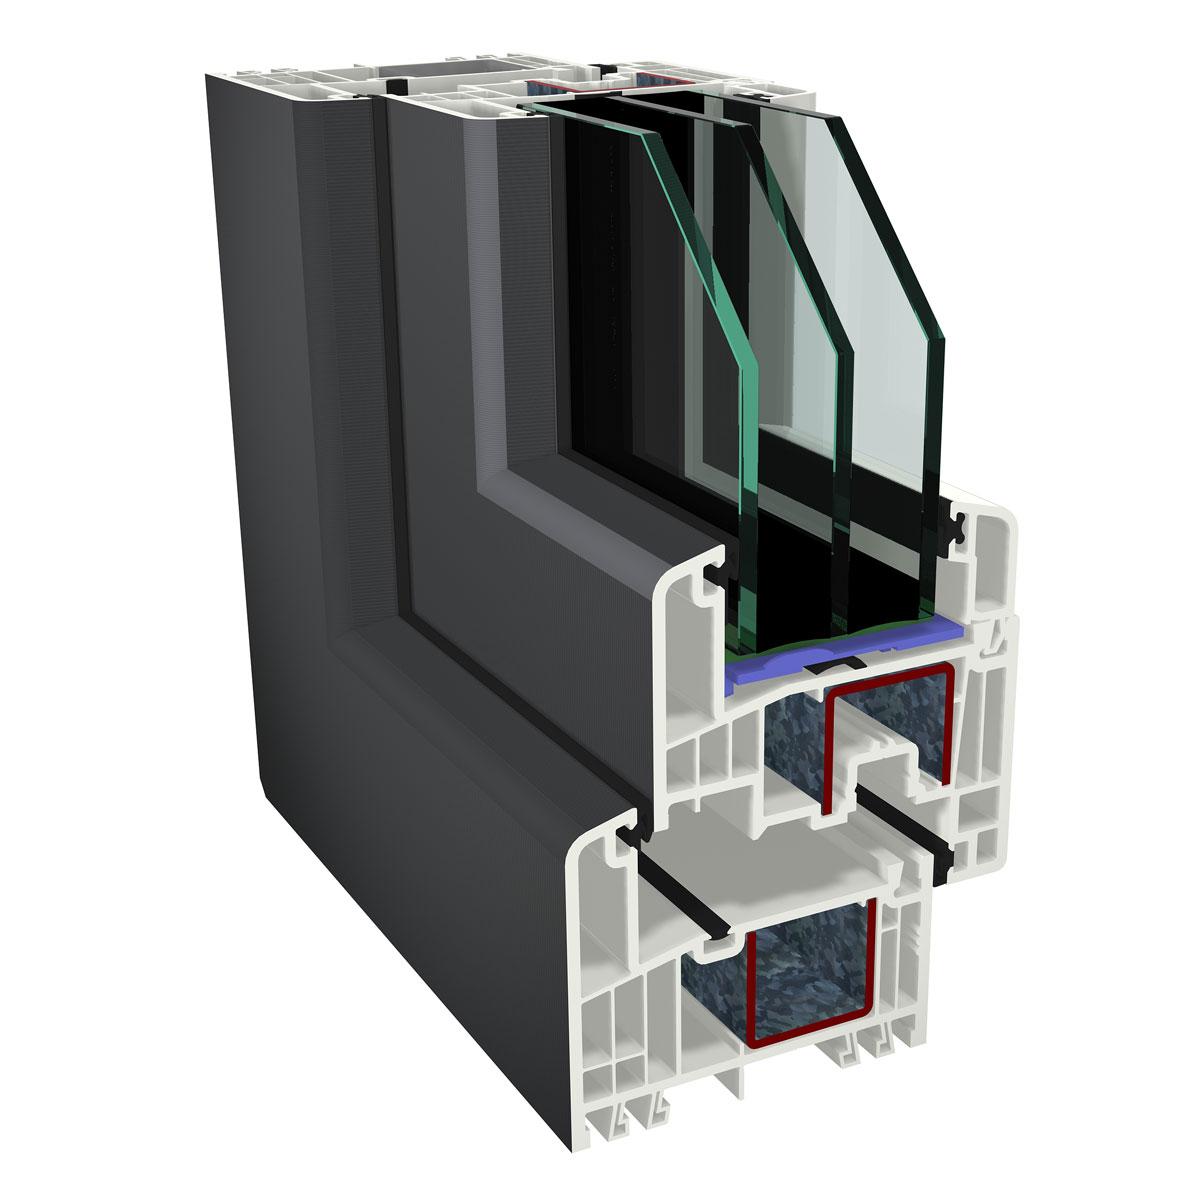 Fenster kunststoff schirling t ren for Fensterelemente kunststoff